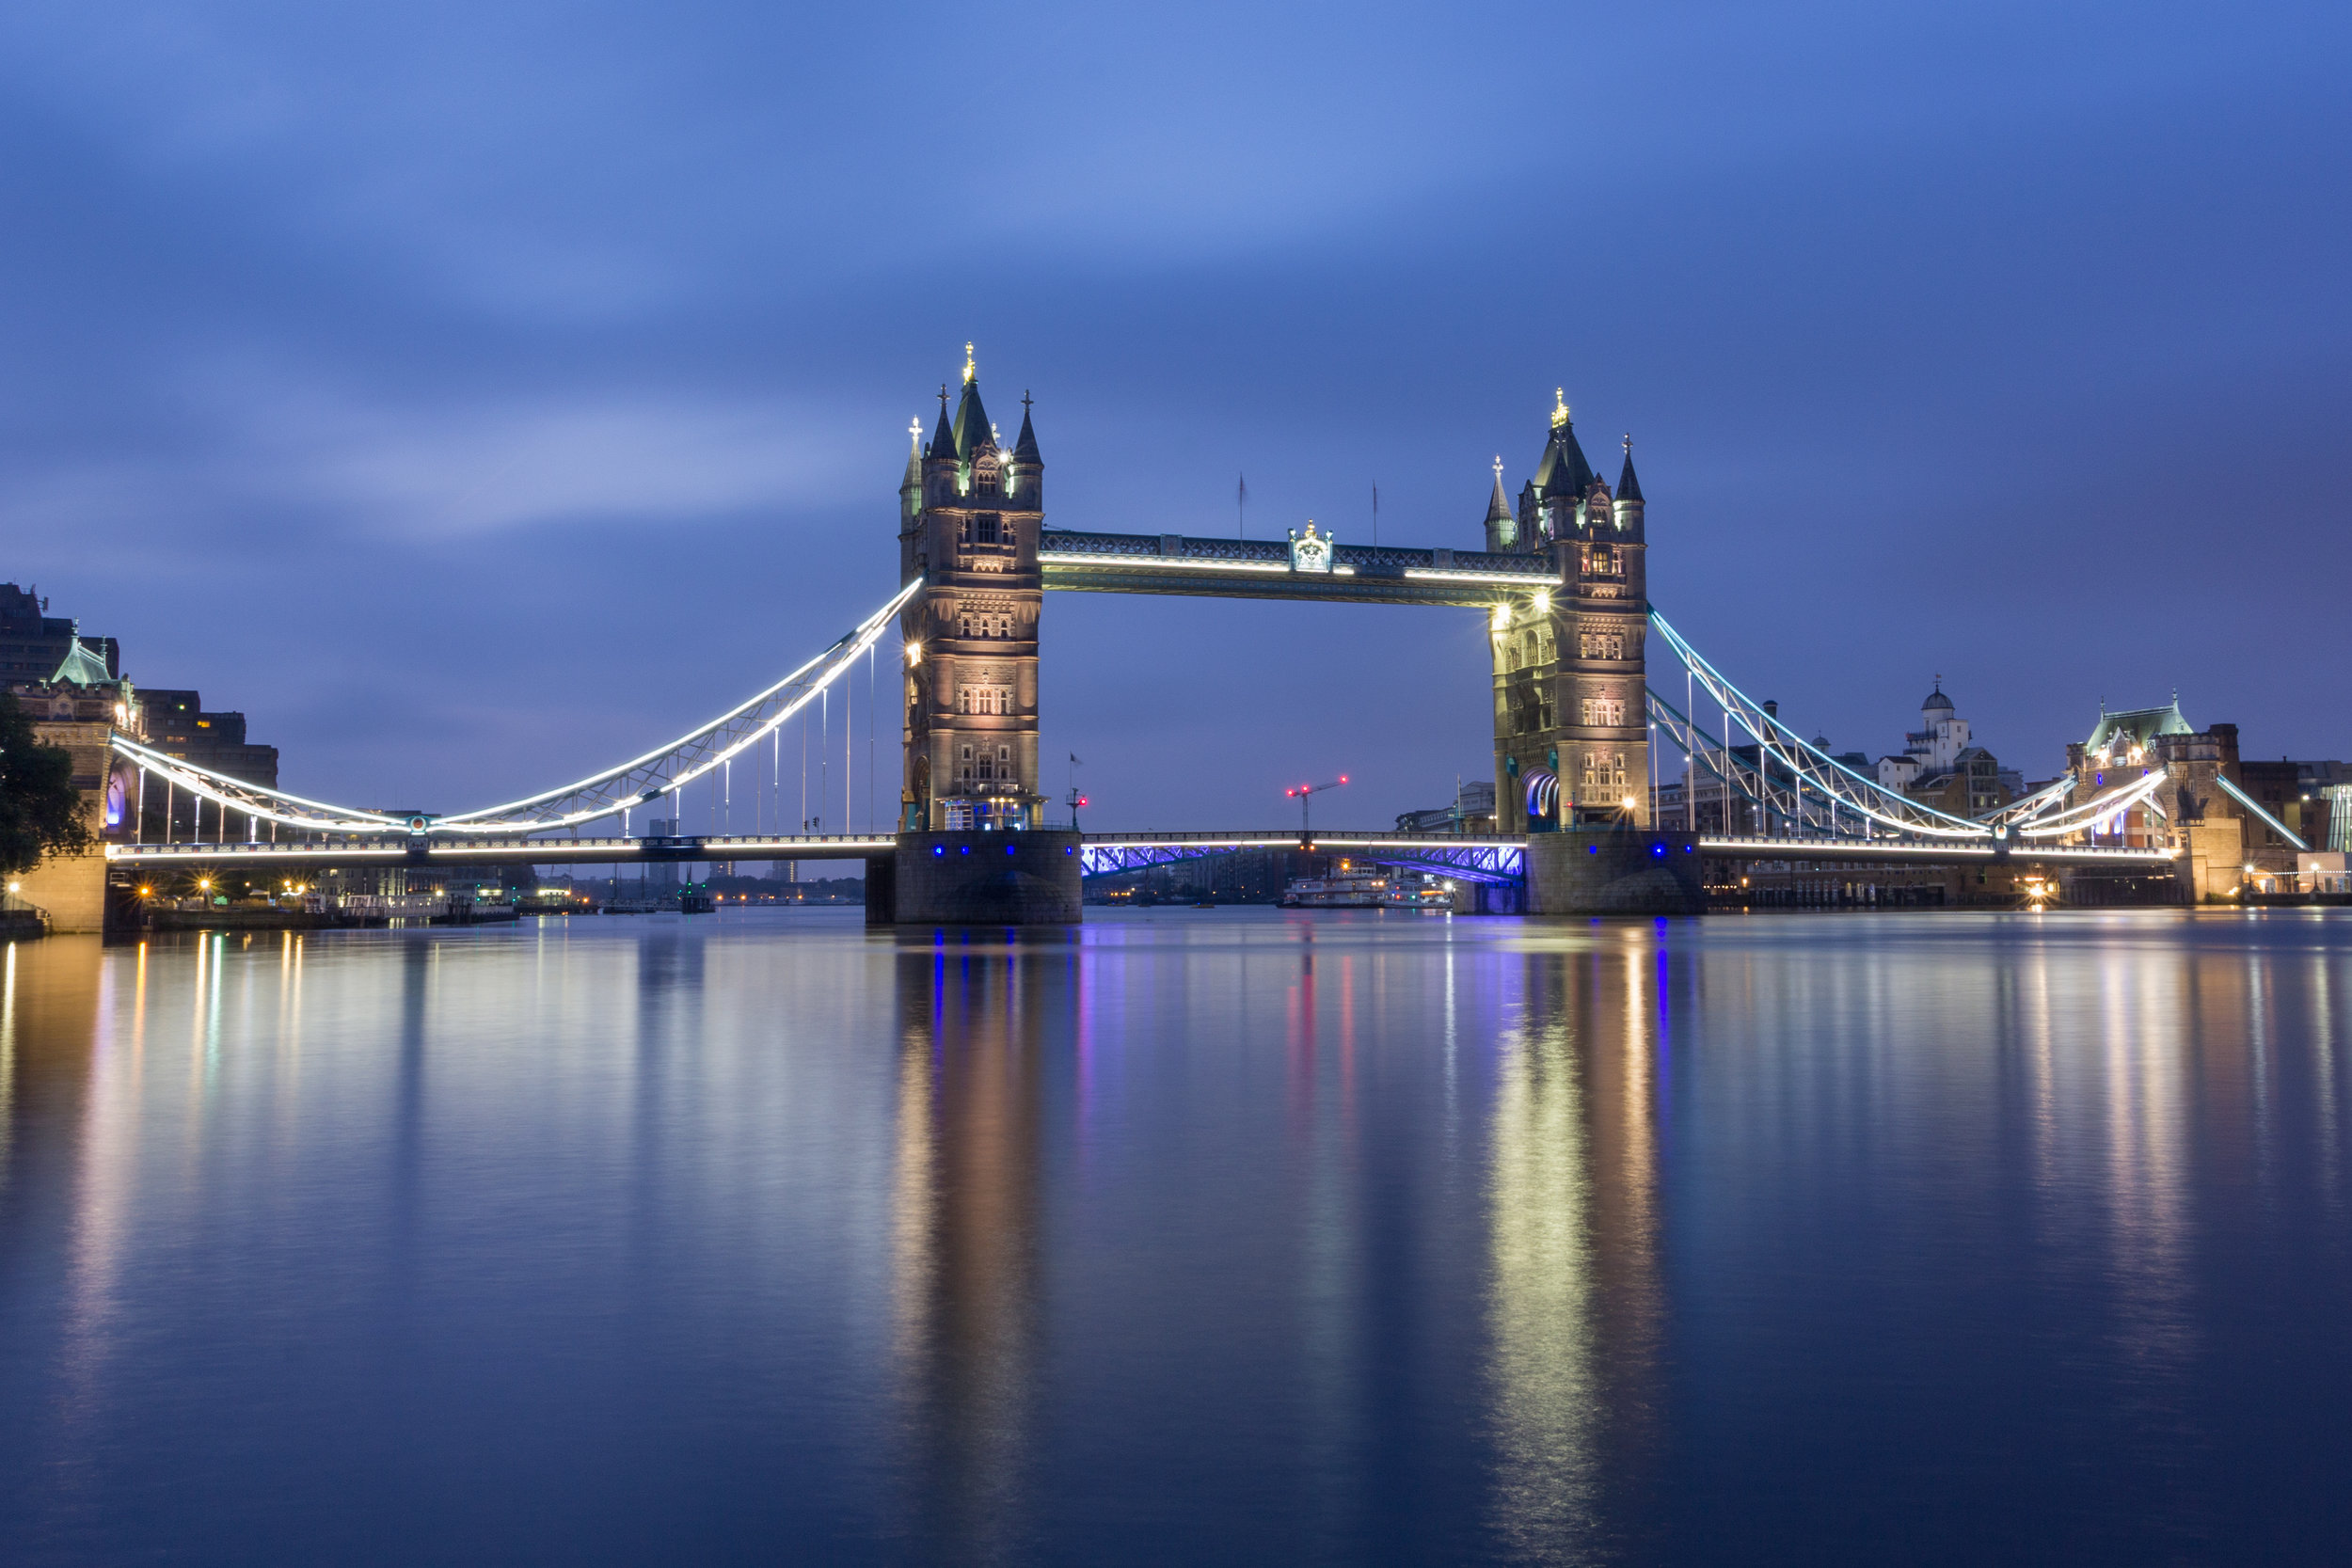 FREE ICONIC LONDON PHOTOWALK - FEBRUARY 16th